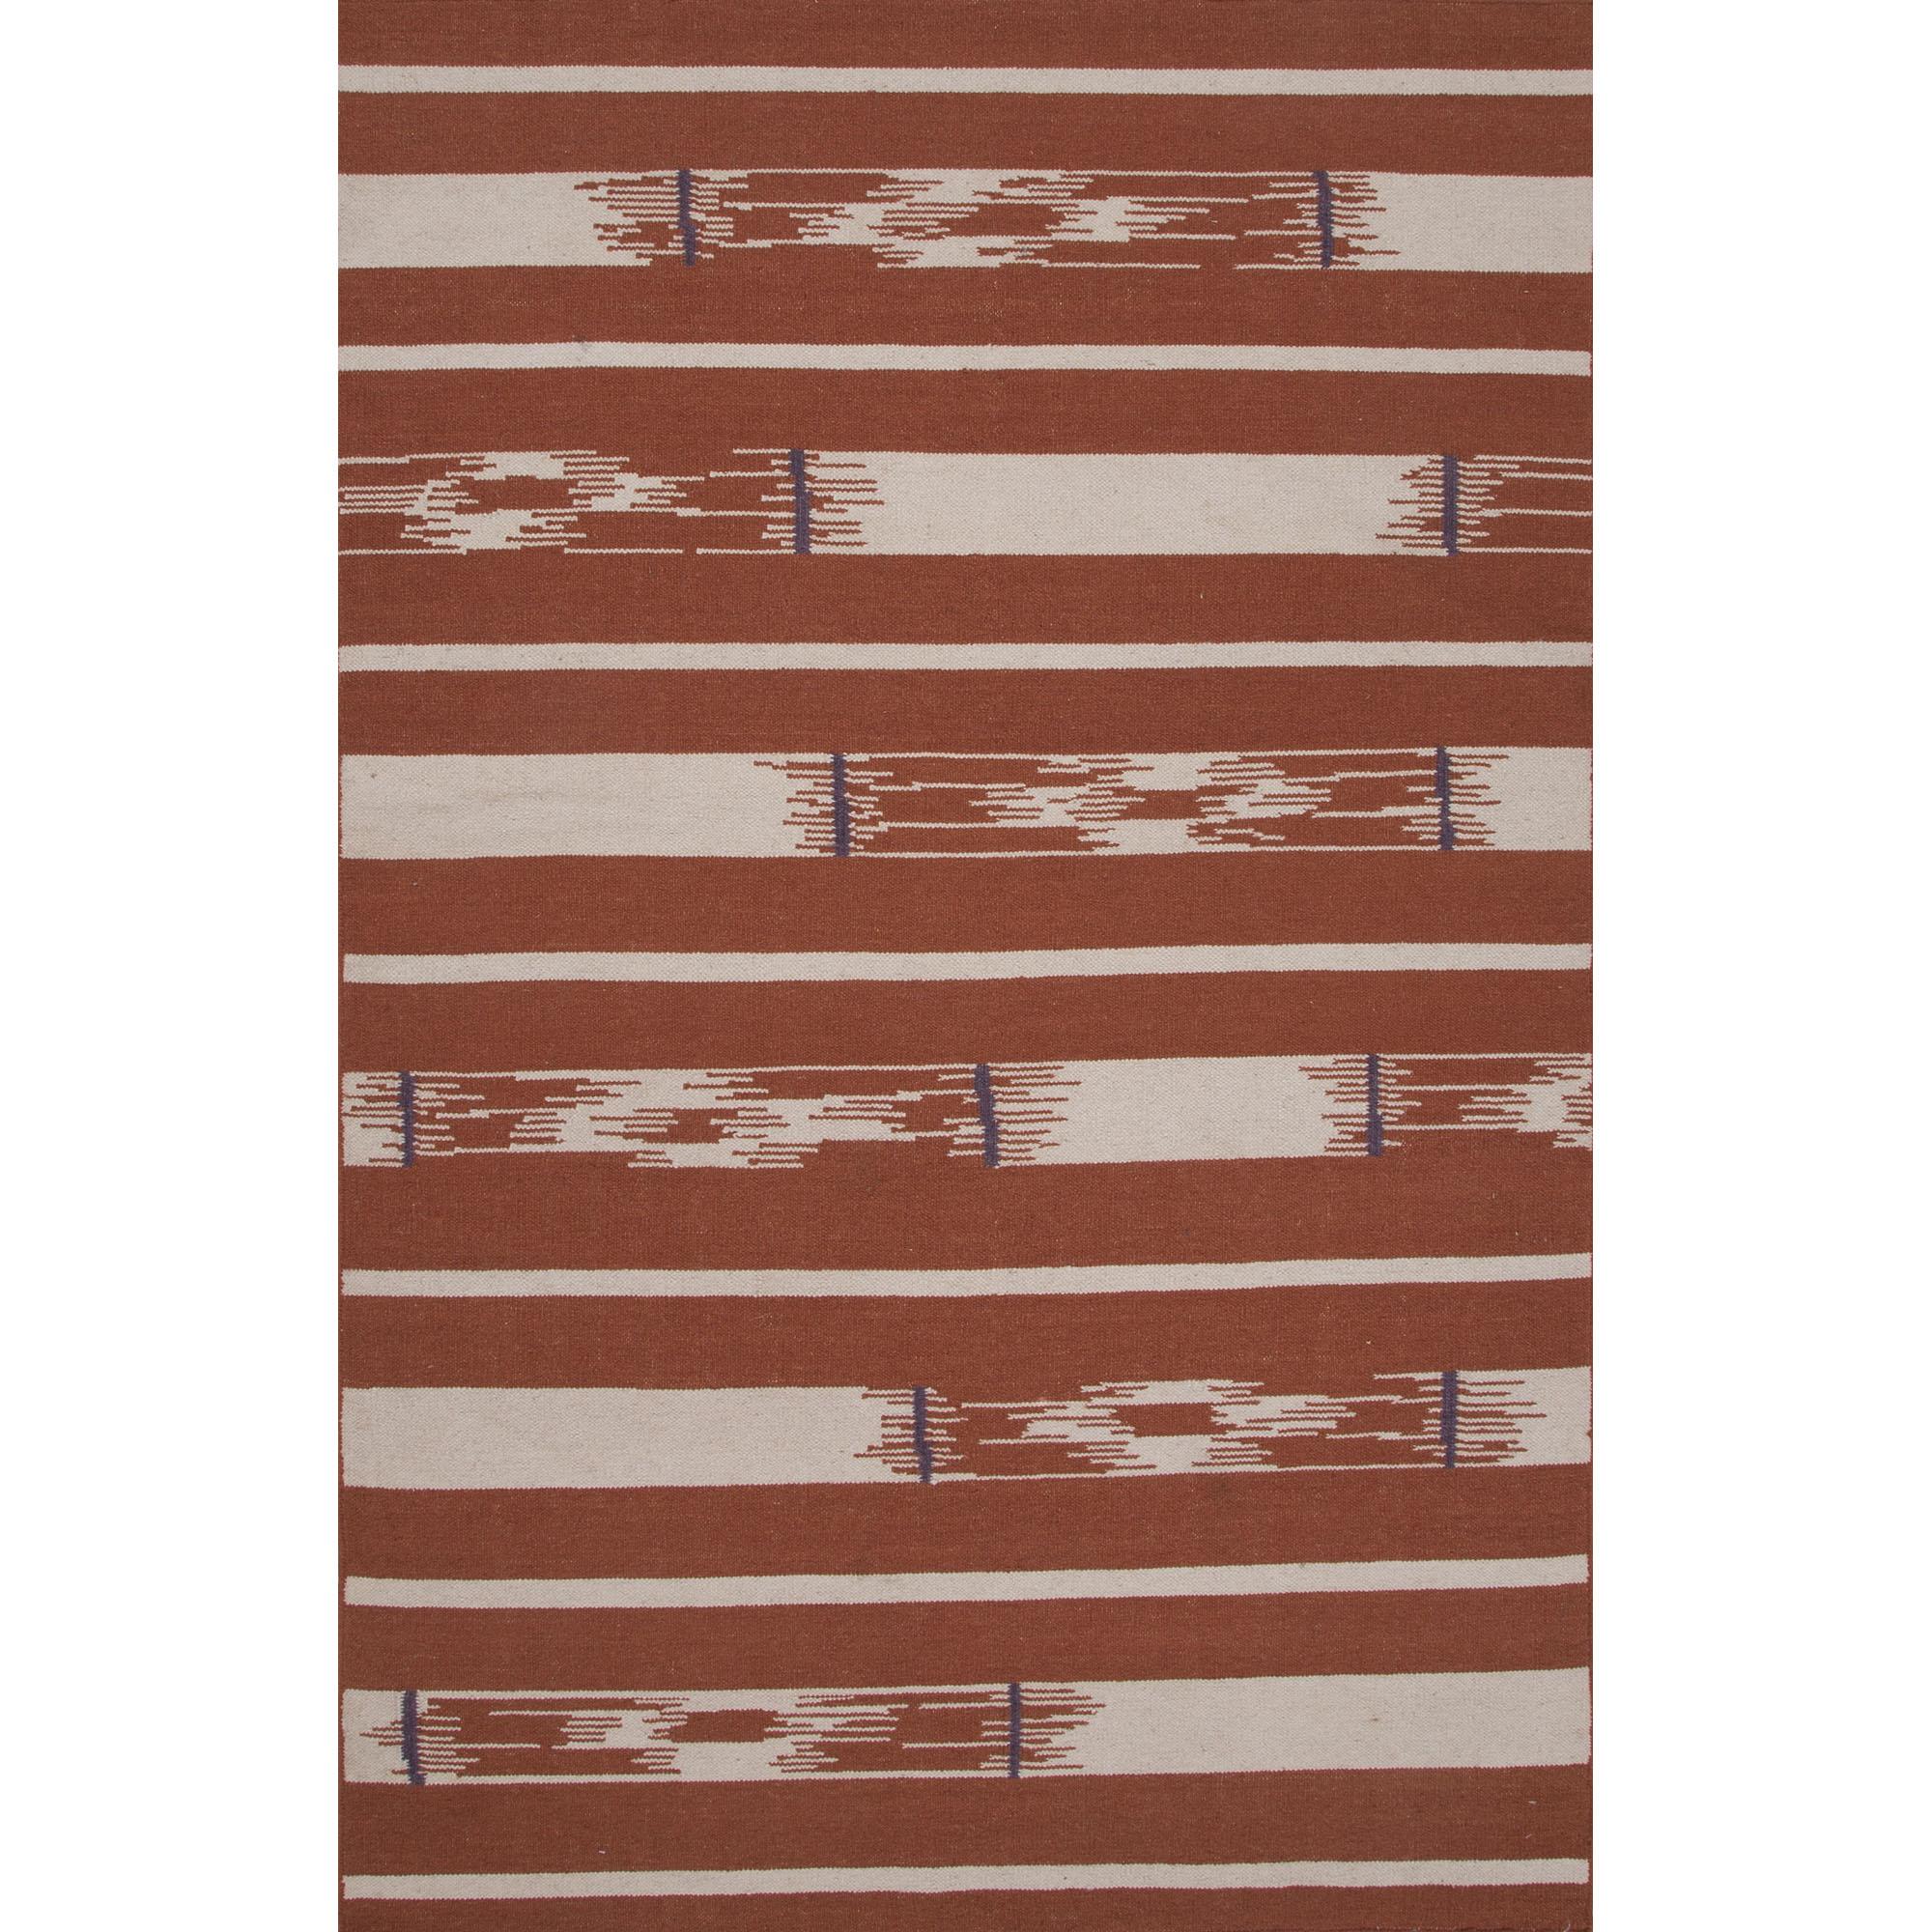 JAIPUR Rugs Traditions Modern Flat Weave 2 x 3 Rug - Item Number: RUG122242